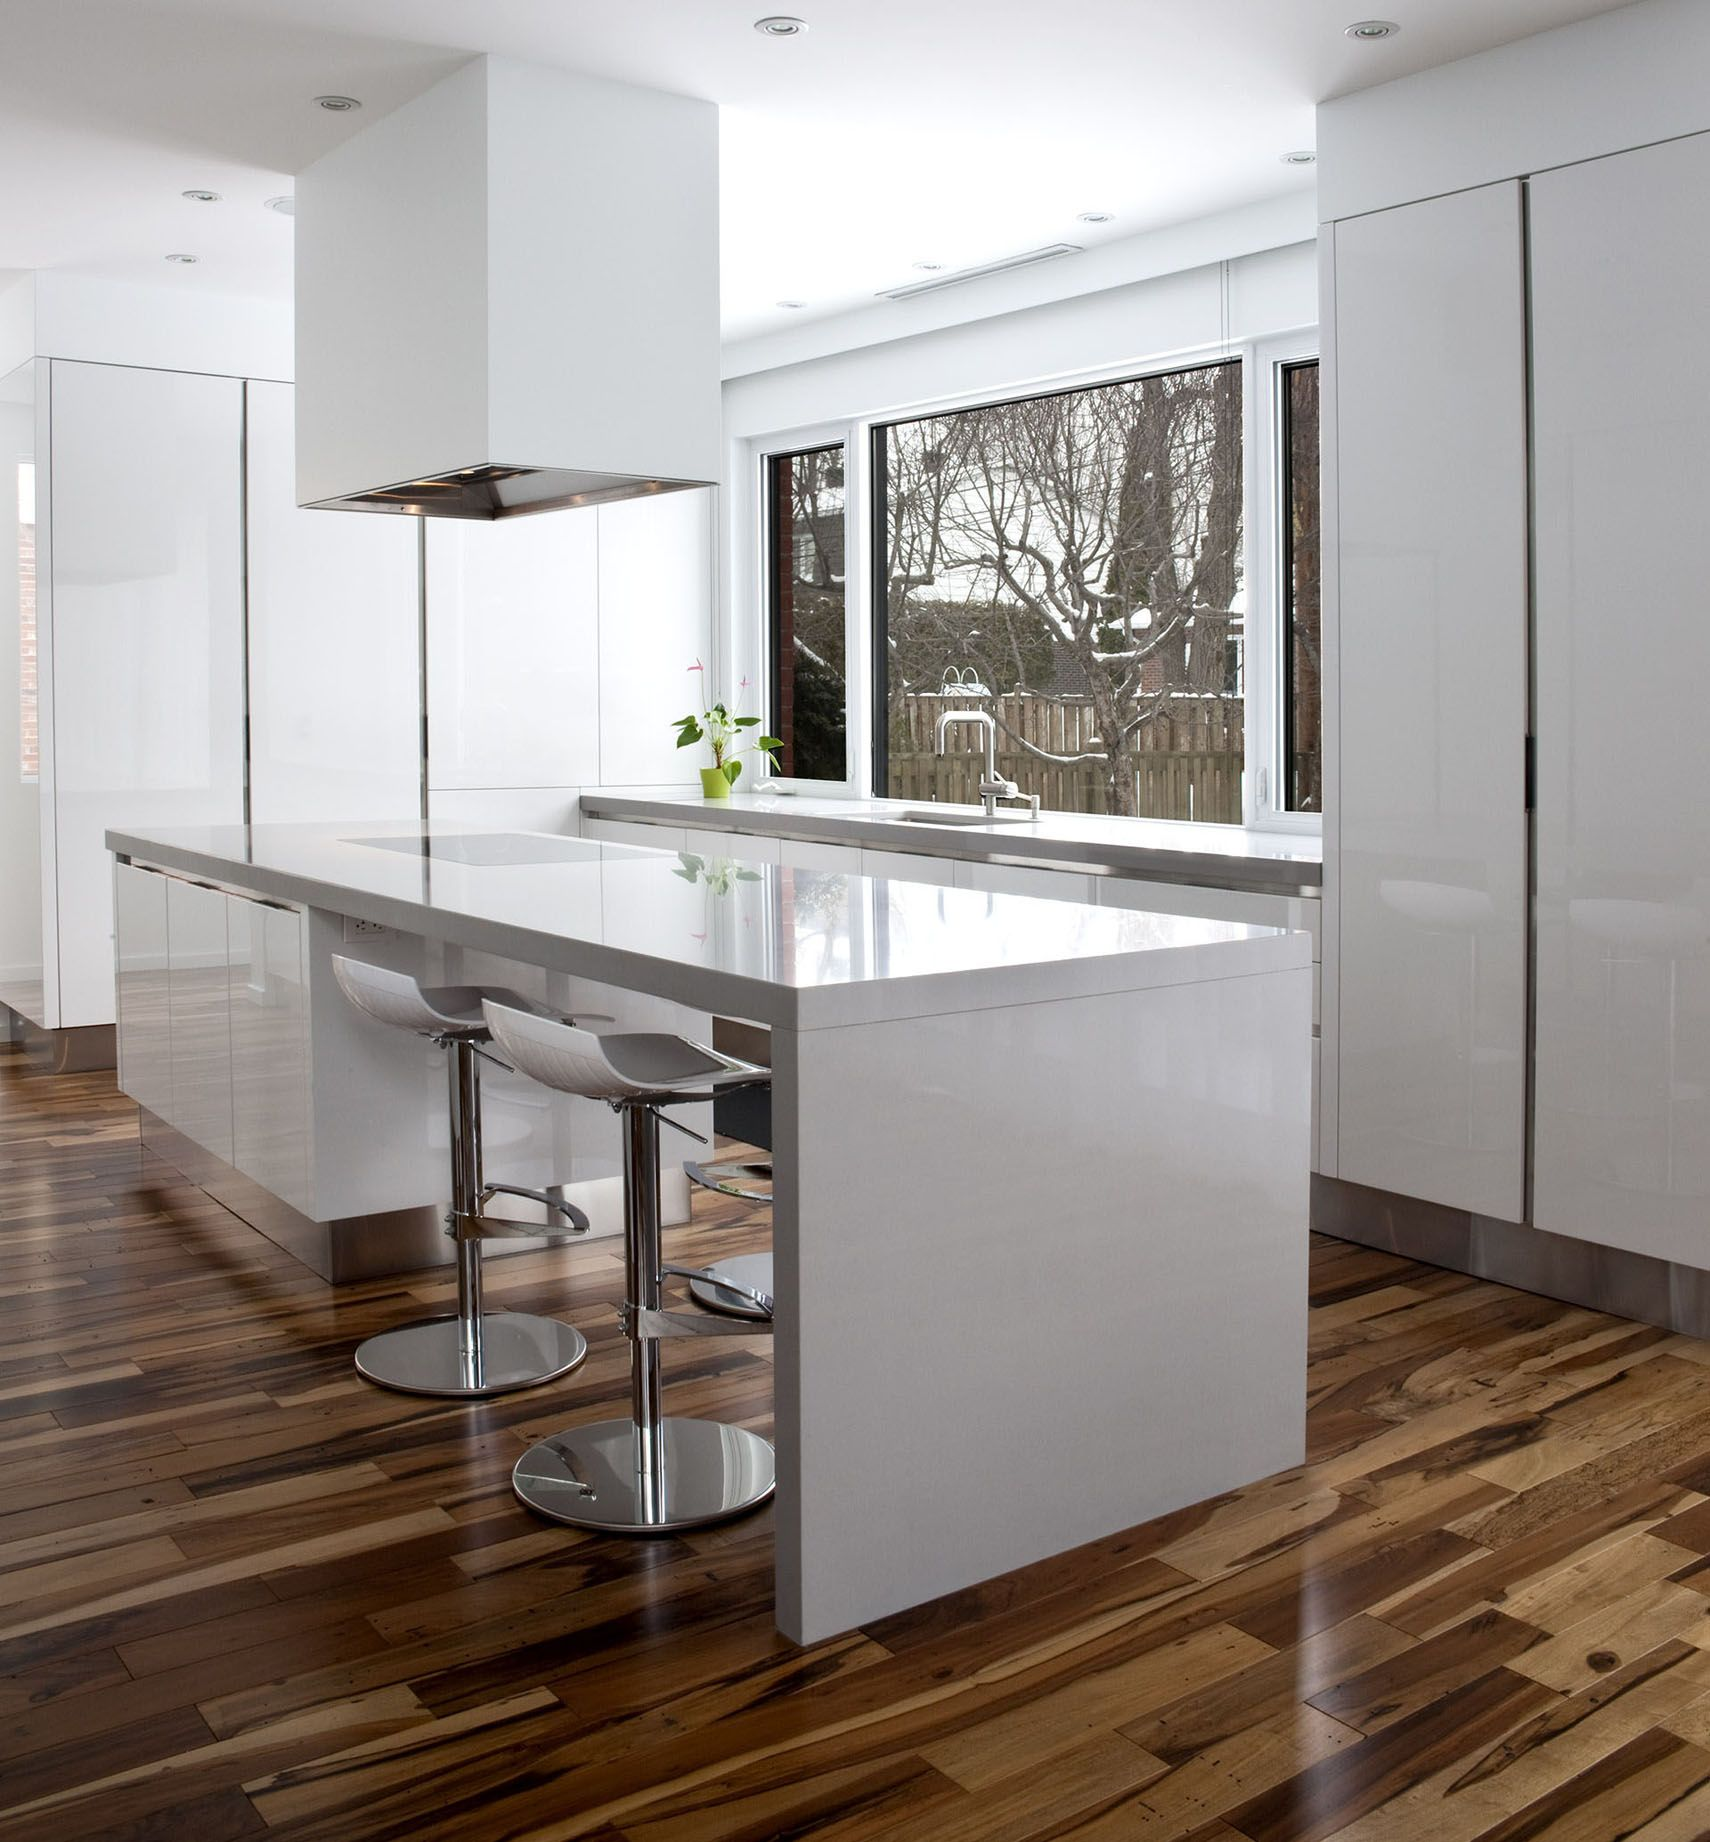 accueil gibeault design inc design cuisine intérieur